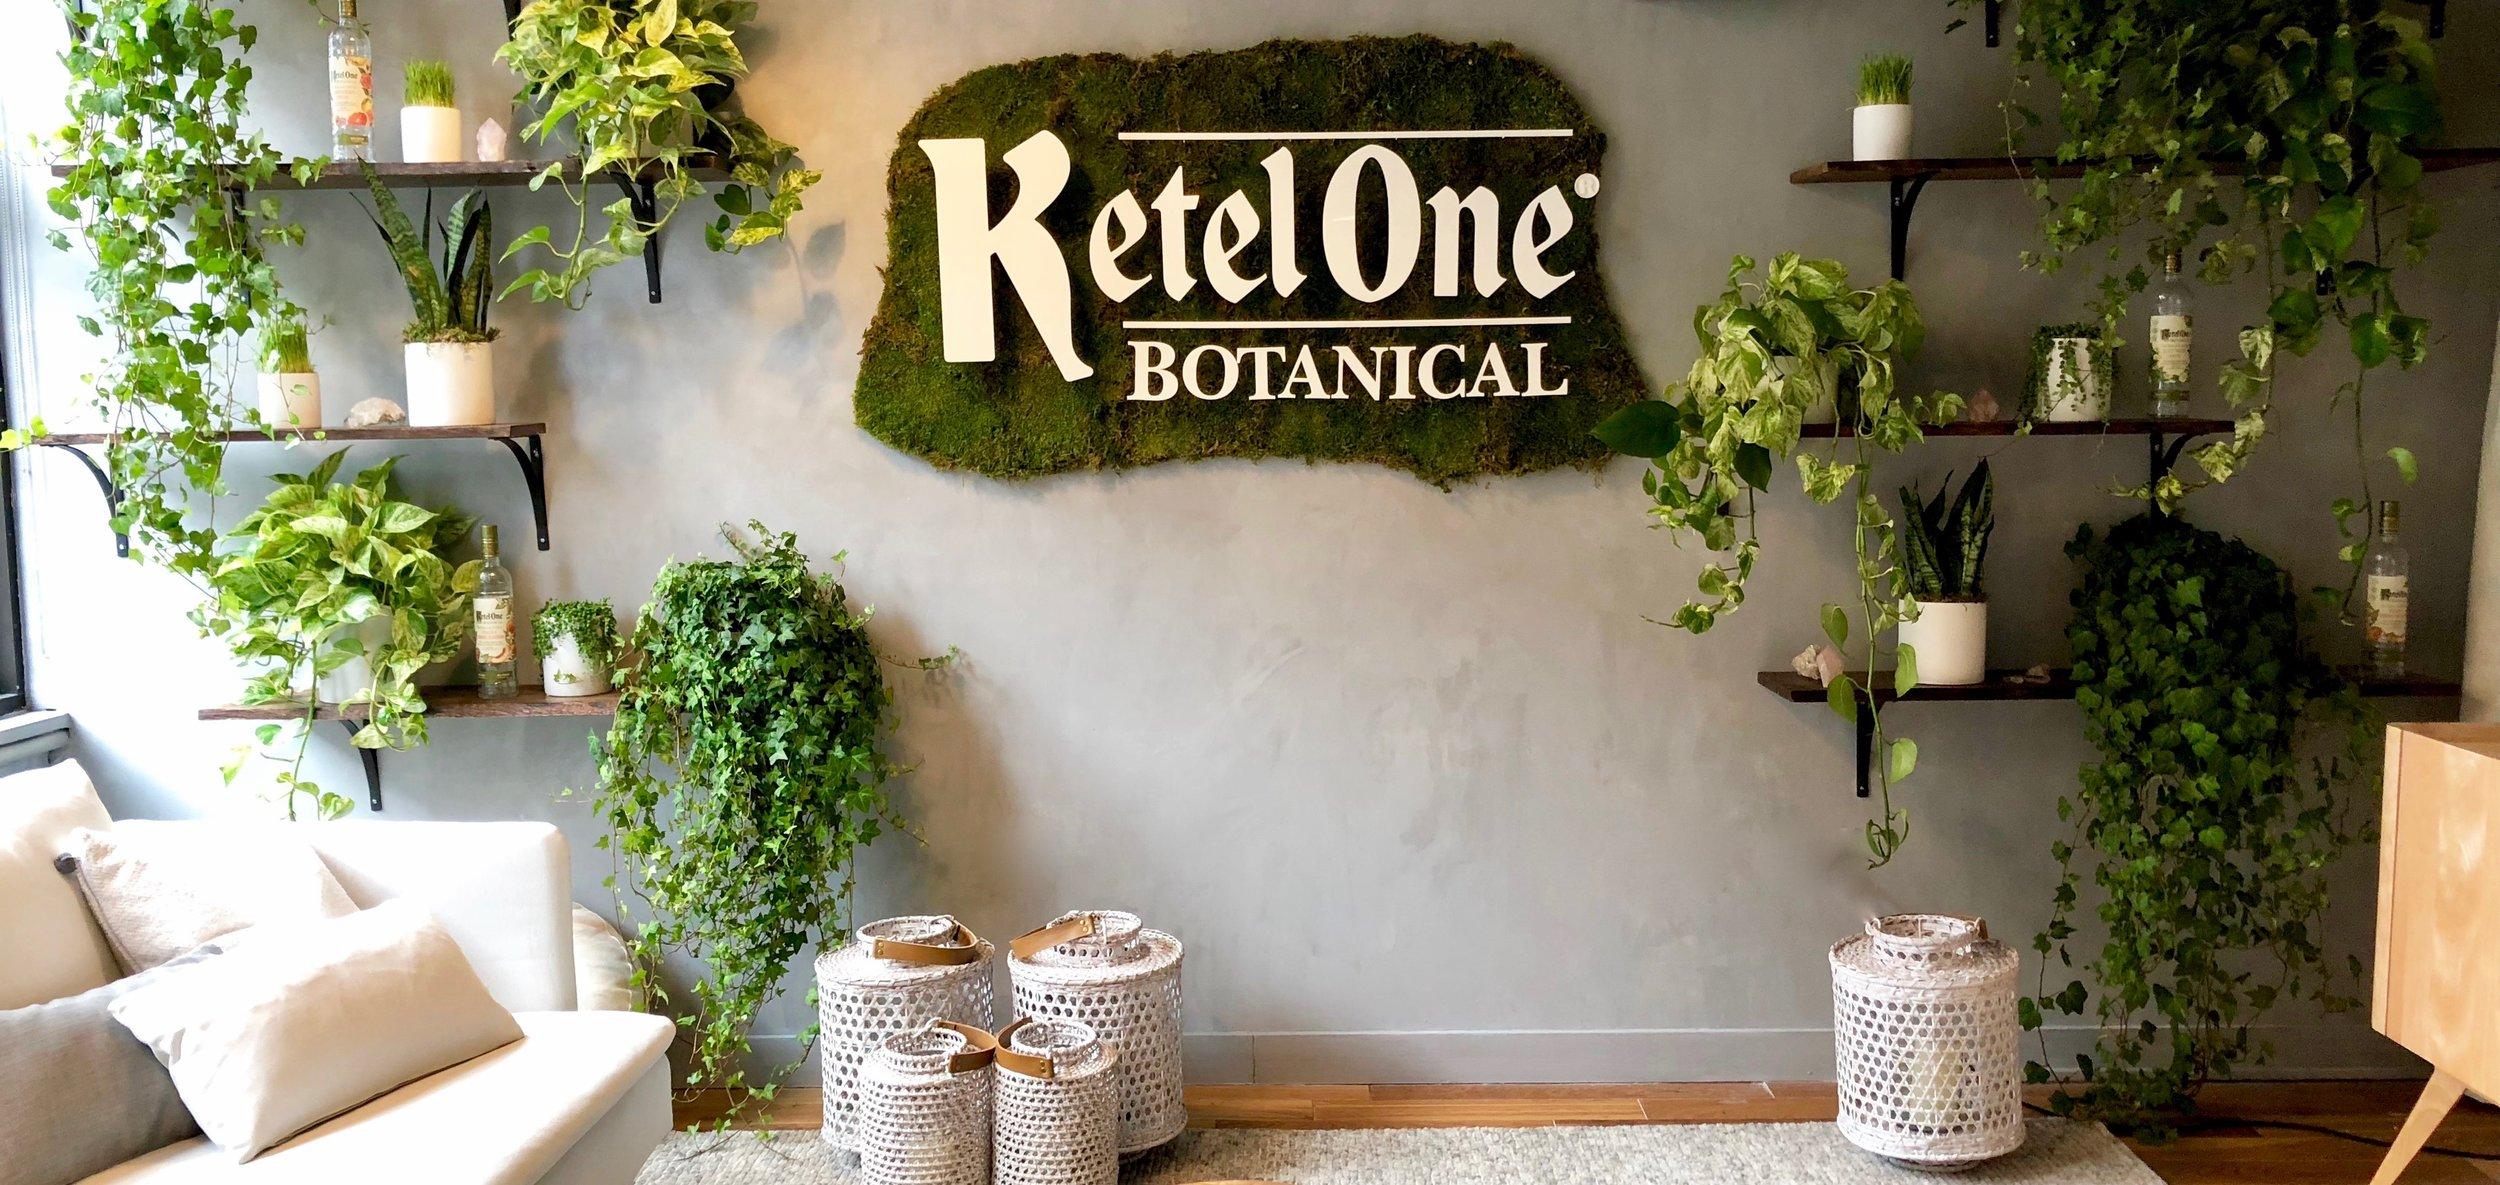 Ketel One Botanical Plant Lounge- B Floral